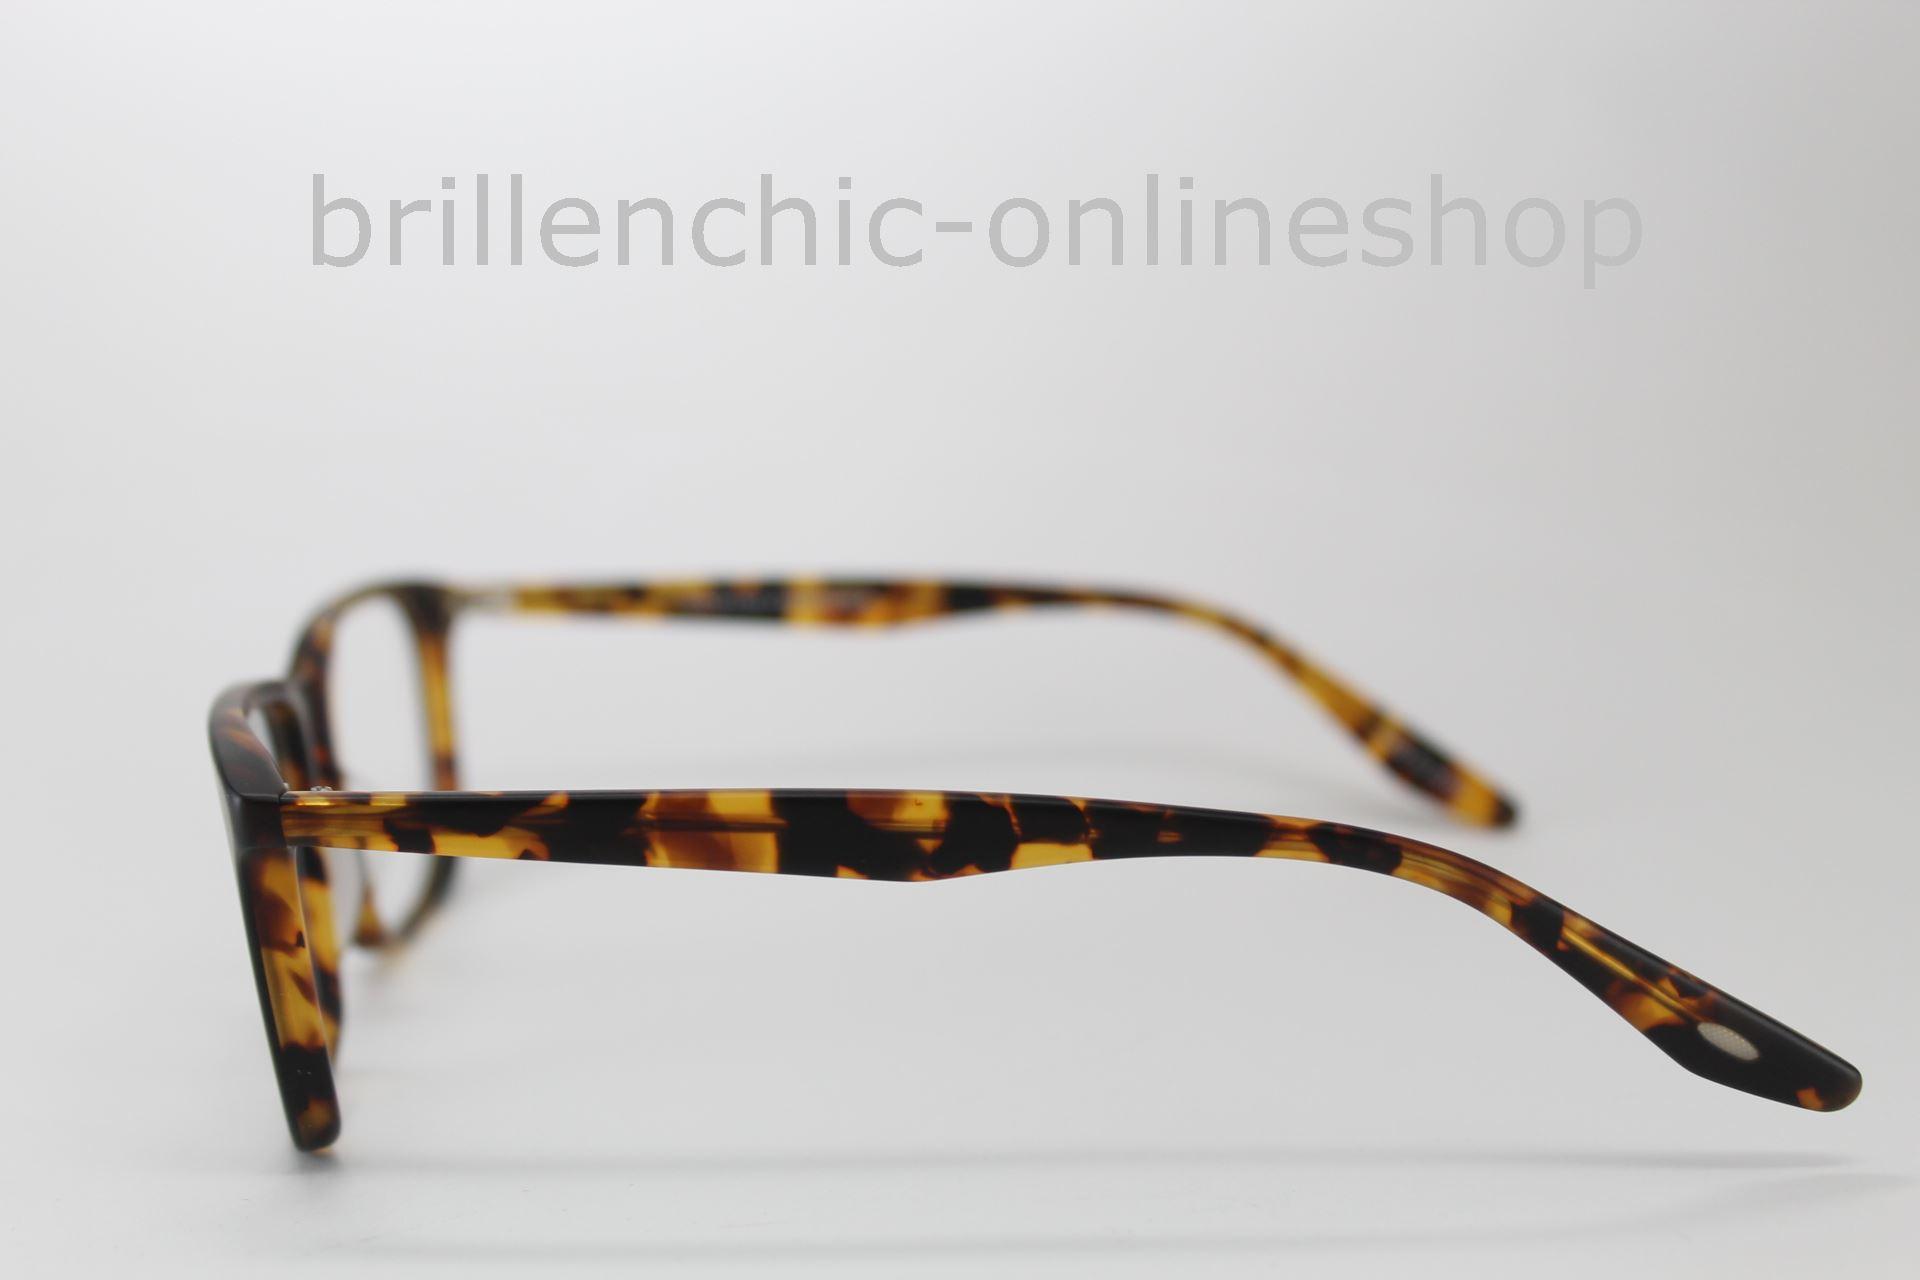 afcb0f406d74 Ebay Chanel Eyeglasses 3155